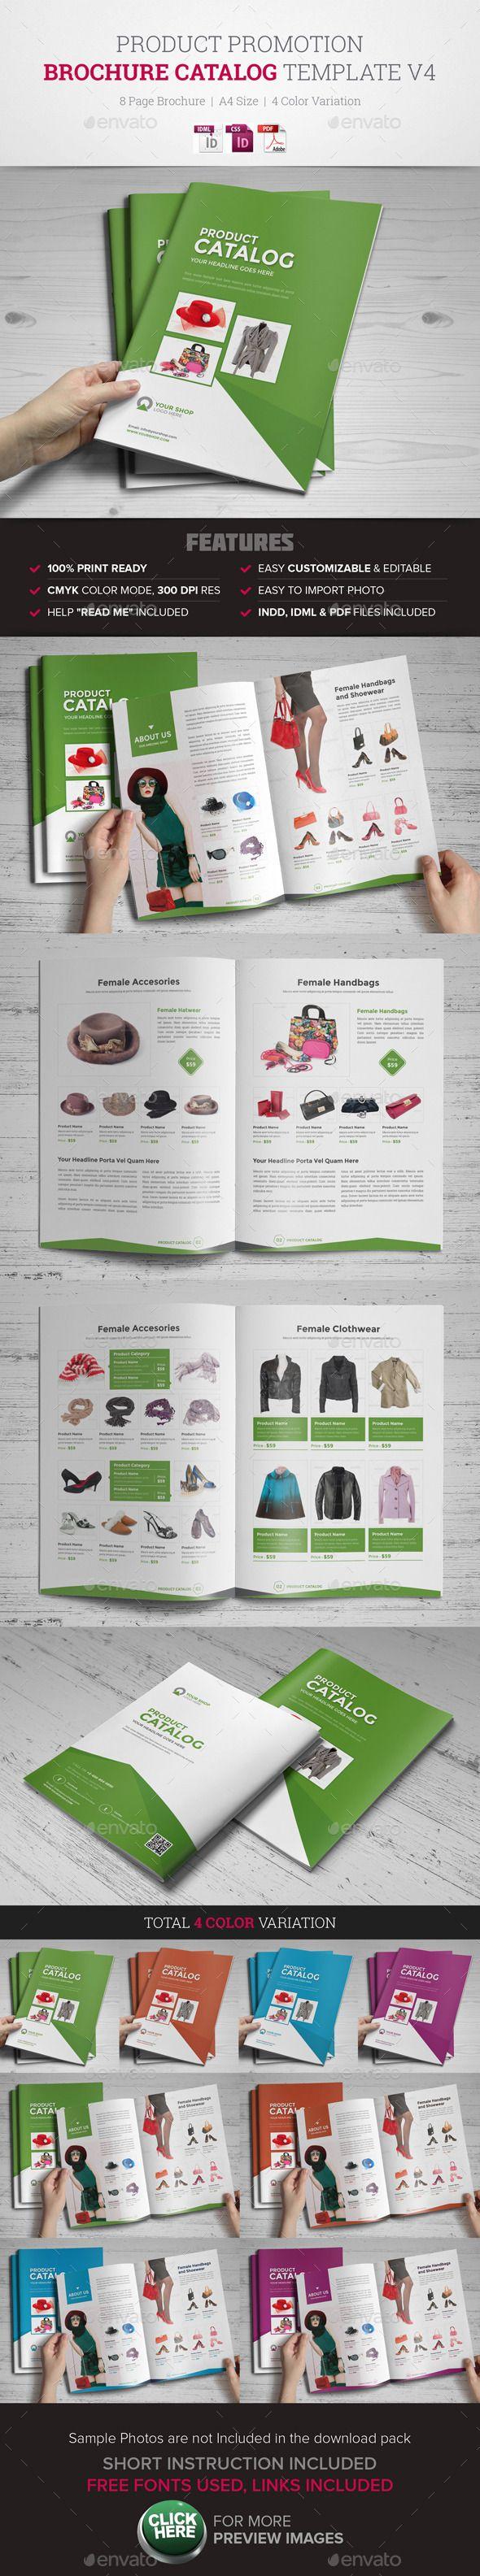 Product Promotion Catalog InDesign Template #catalog #catalogtemplate Download: http://graphicriver.net/item/product-promotion-catalog-indesign-template-v4/11473441?ref=ksioks